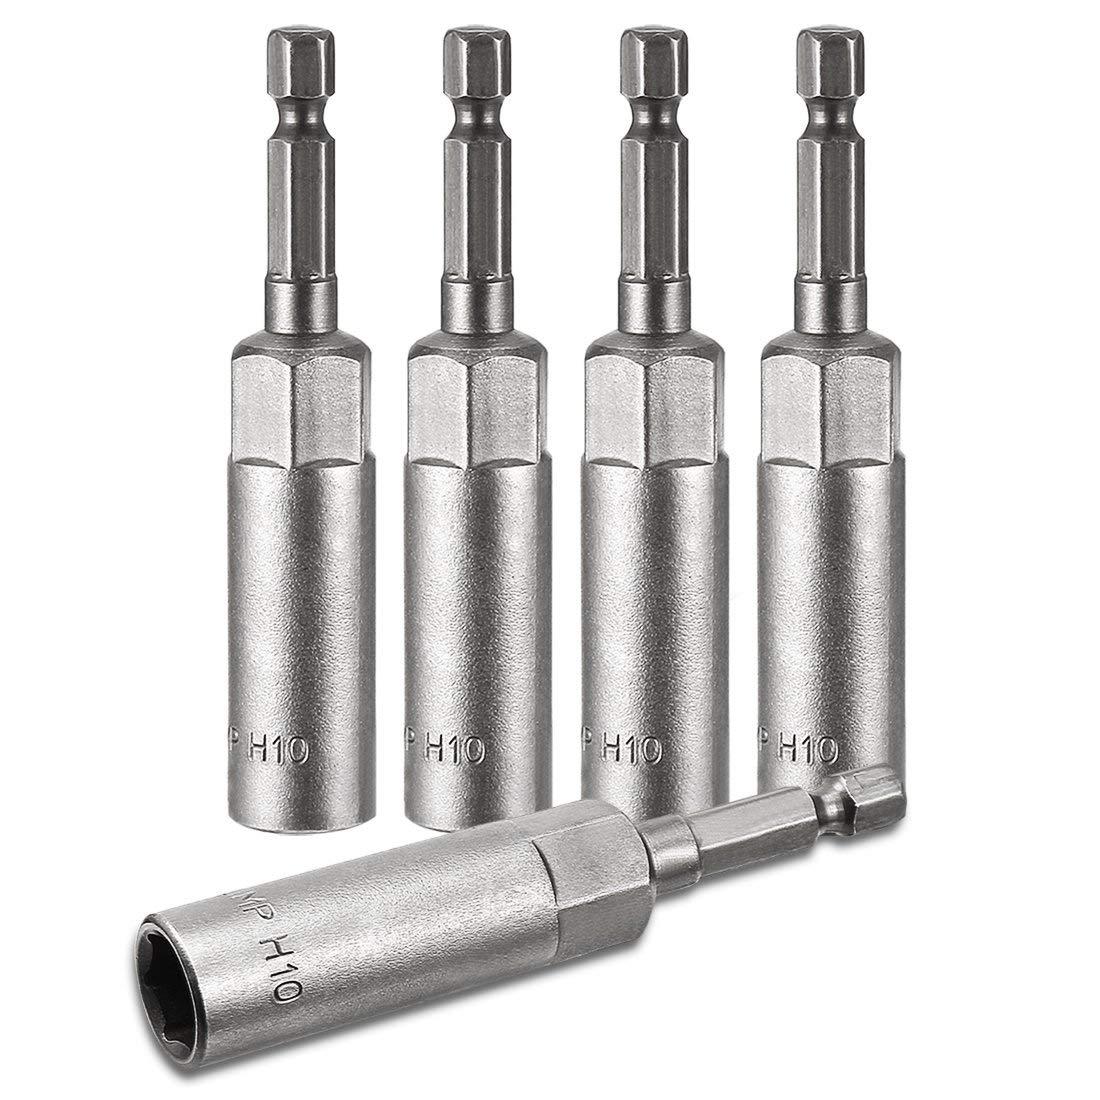 ZCHXD 5Pcs 1/4 Inch Quick Change Shank Cr-V 10mm Hex Nut Driver, 3 Inch Length